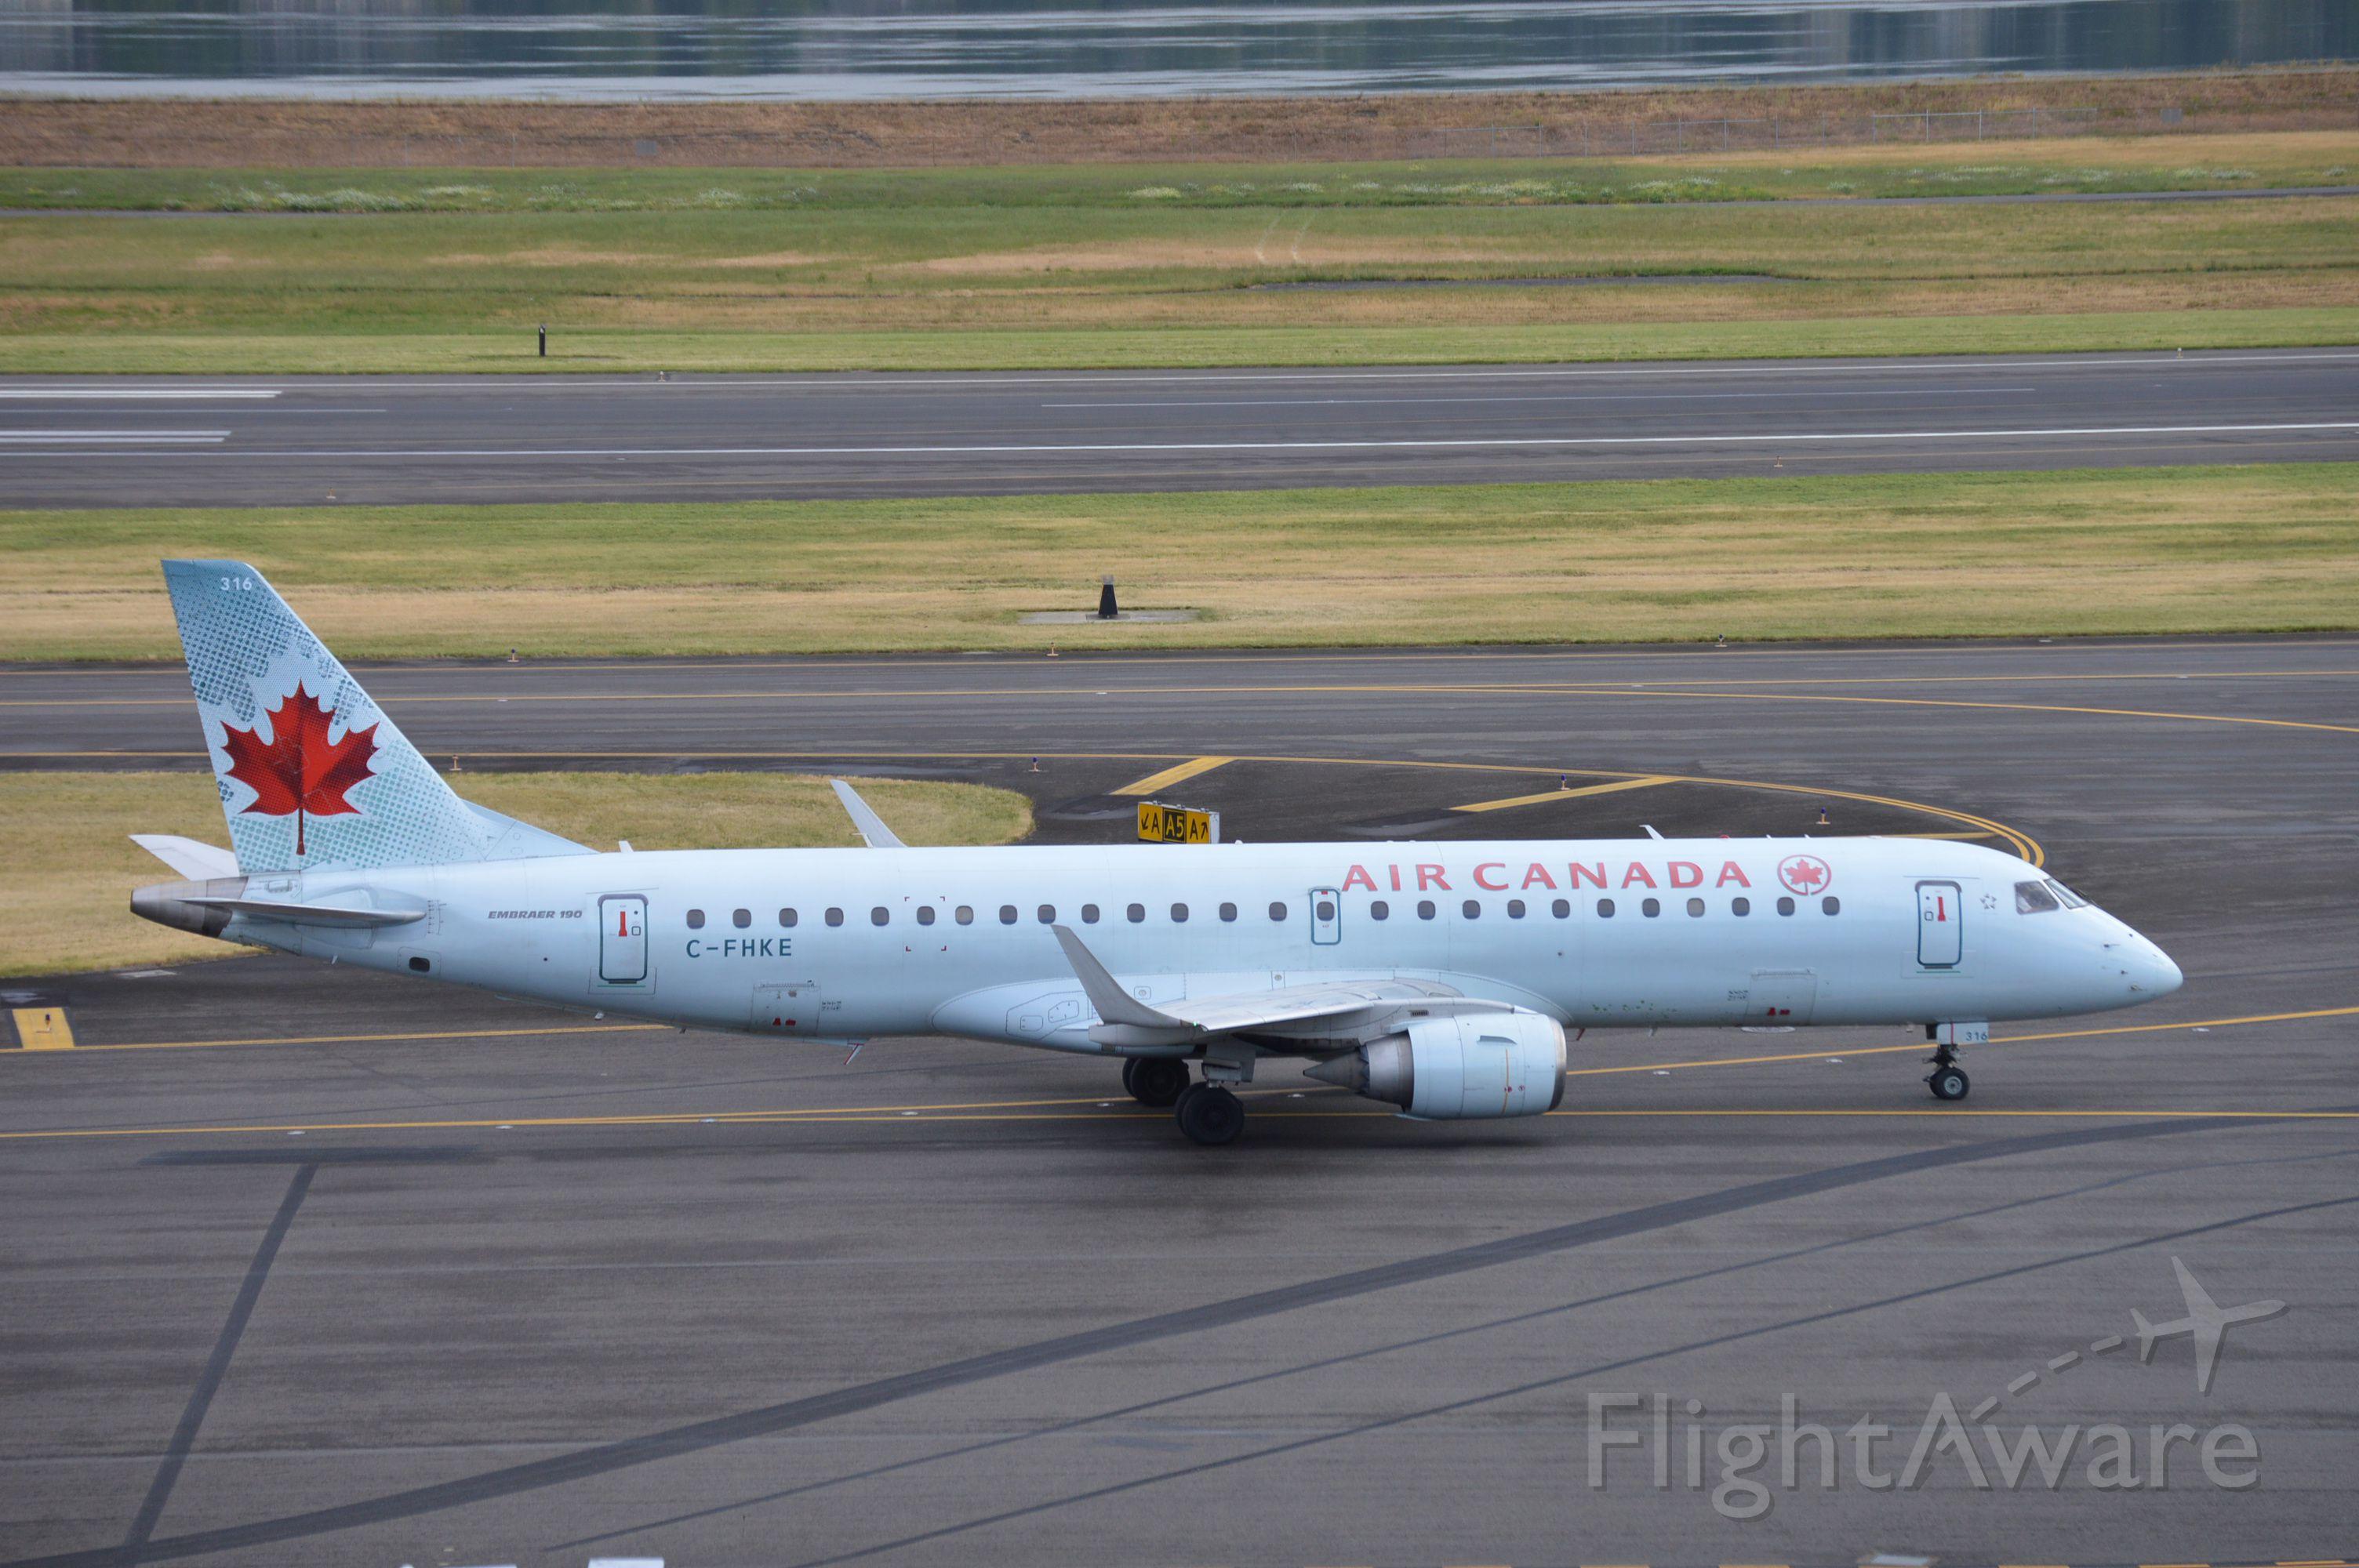 Embraer ERJ-190 (C-FHKE) - ACA546 taxiing for departure.